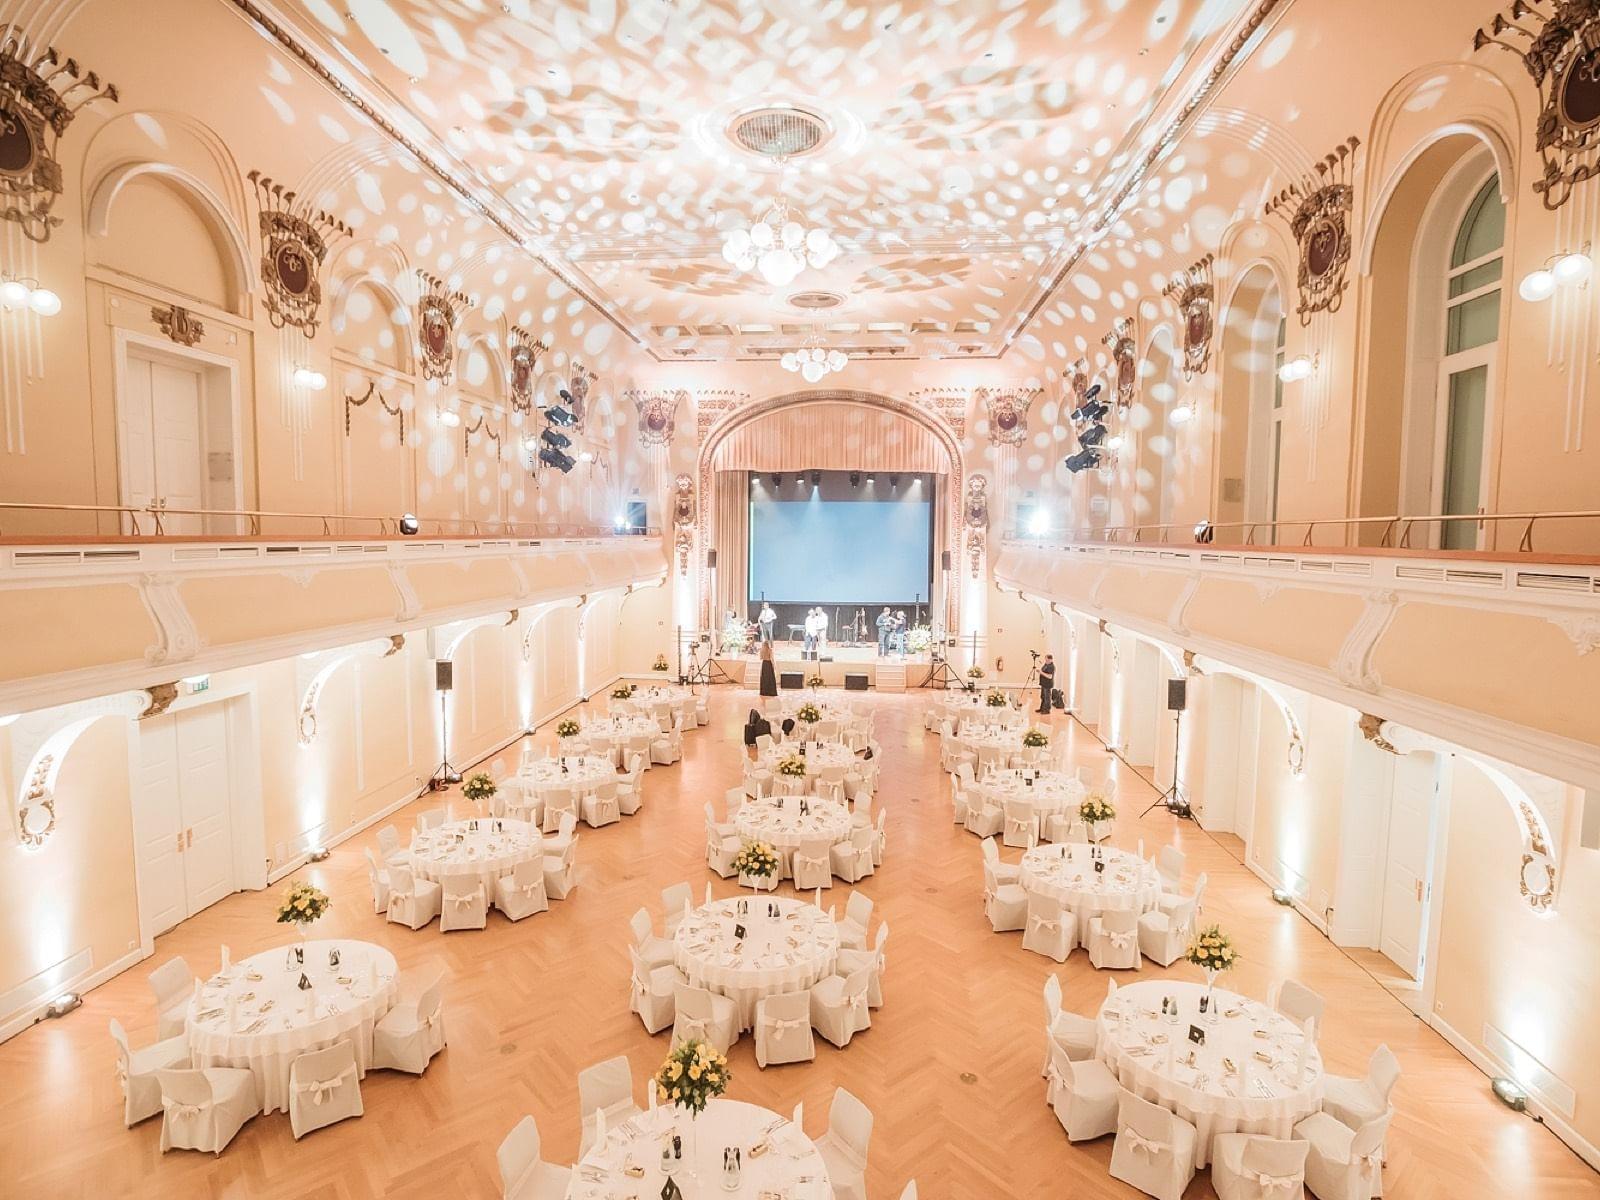 Events spaces at Grand Hotel Union in Ljubljana